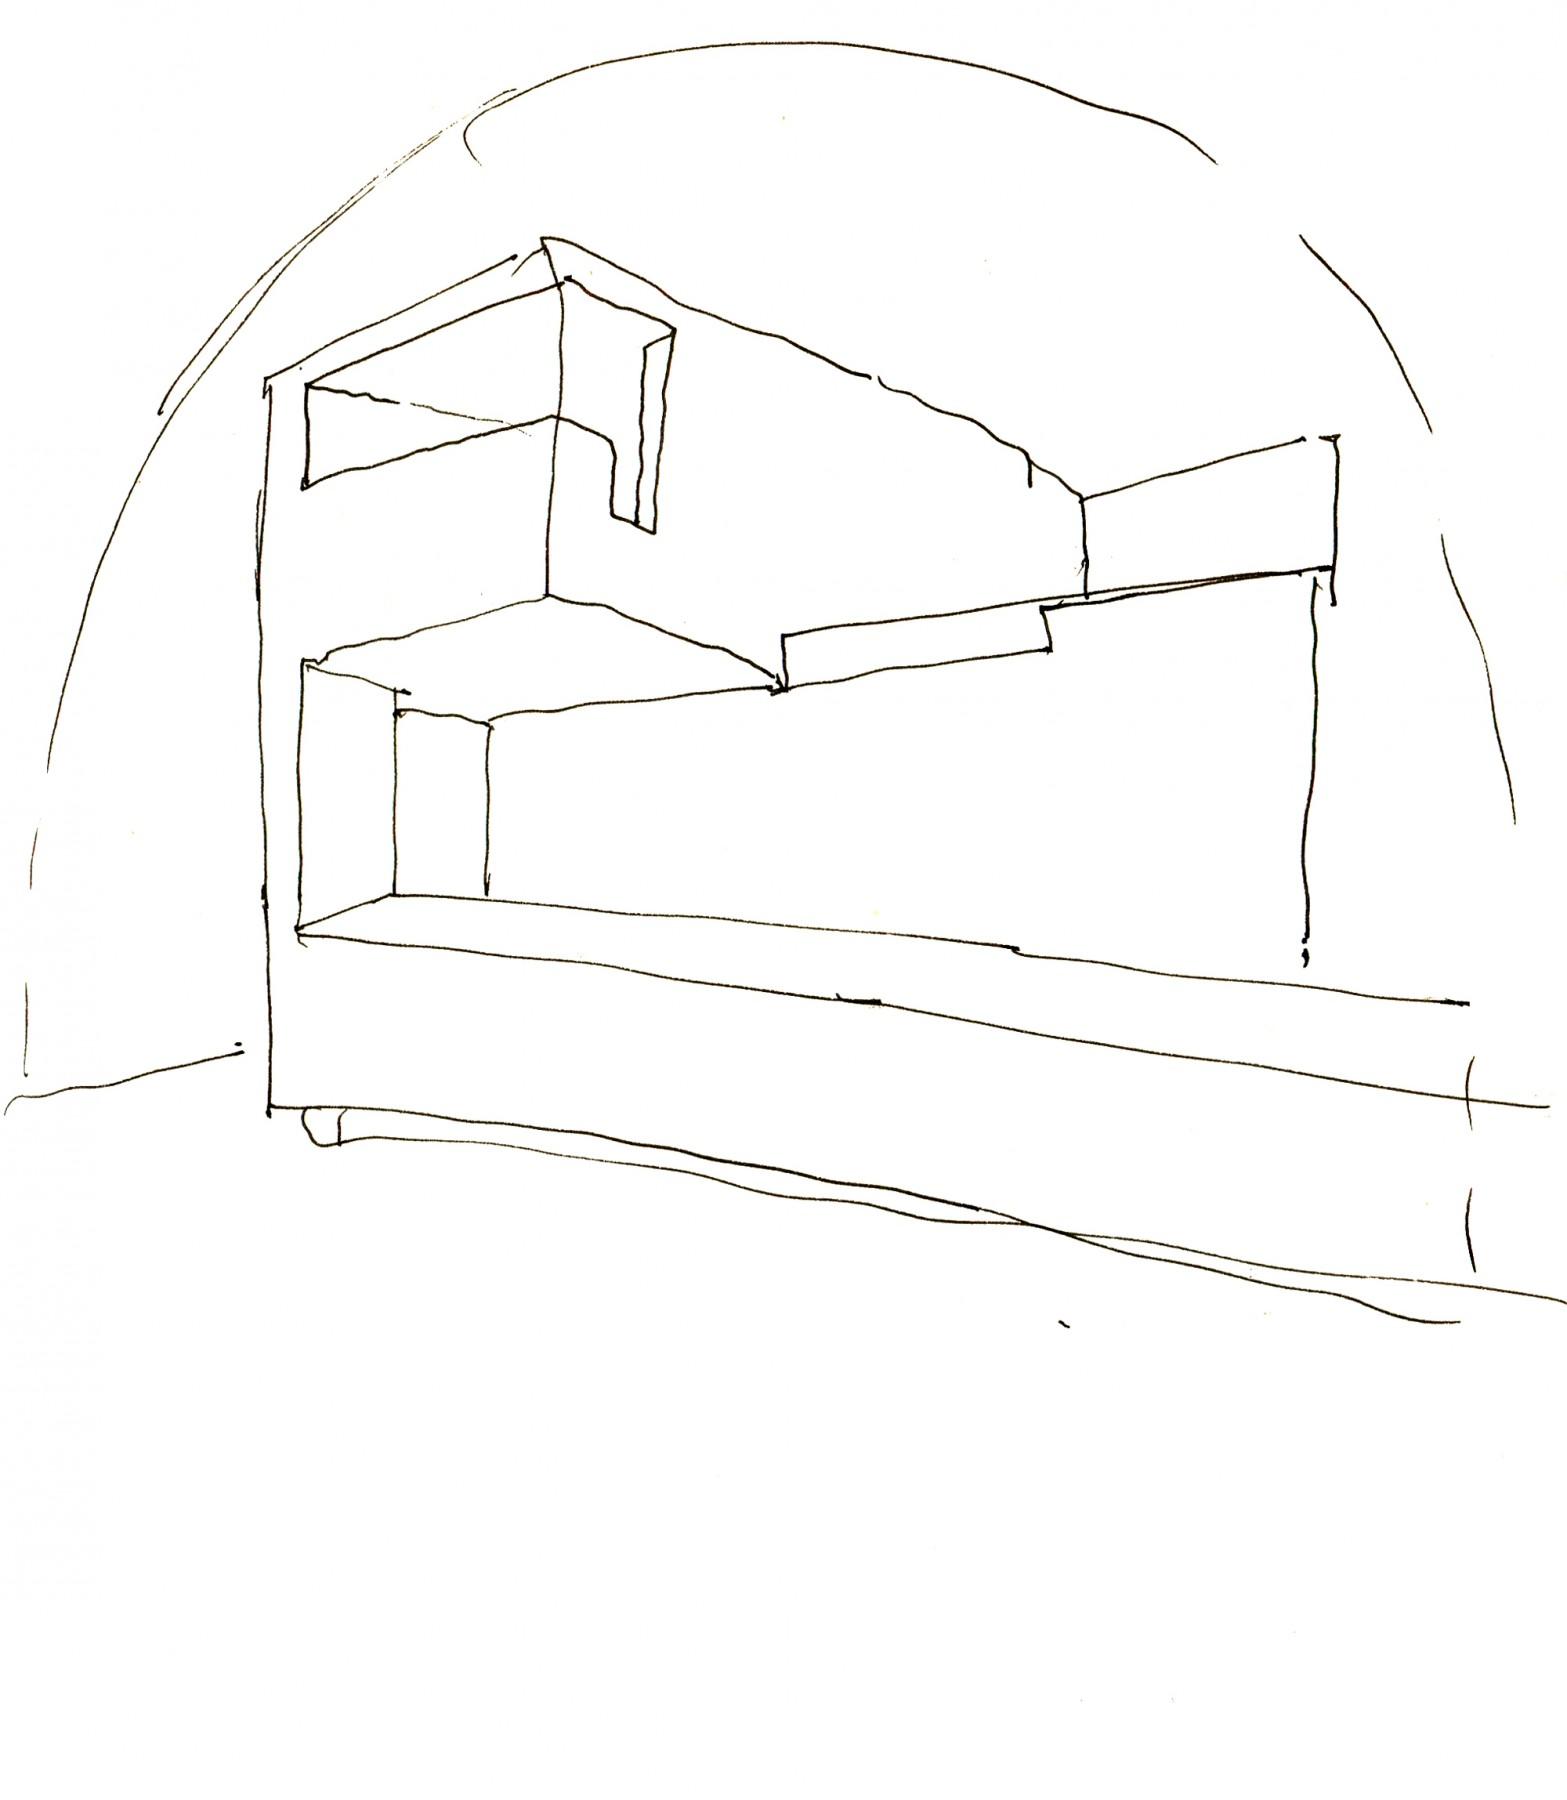 Cargo-East-London-Shoreditch-cultural-scene-bar-restaurant-urban-disused-railway-yard-entertainment-venue-events-Jamie-Fobert-Architects-sketch